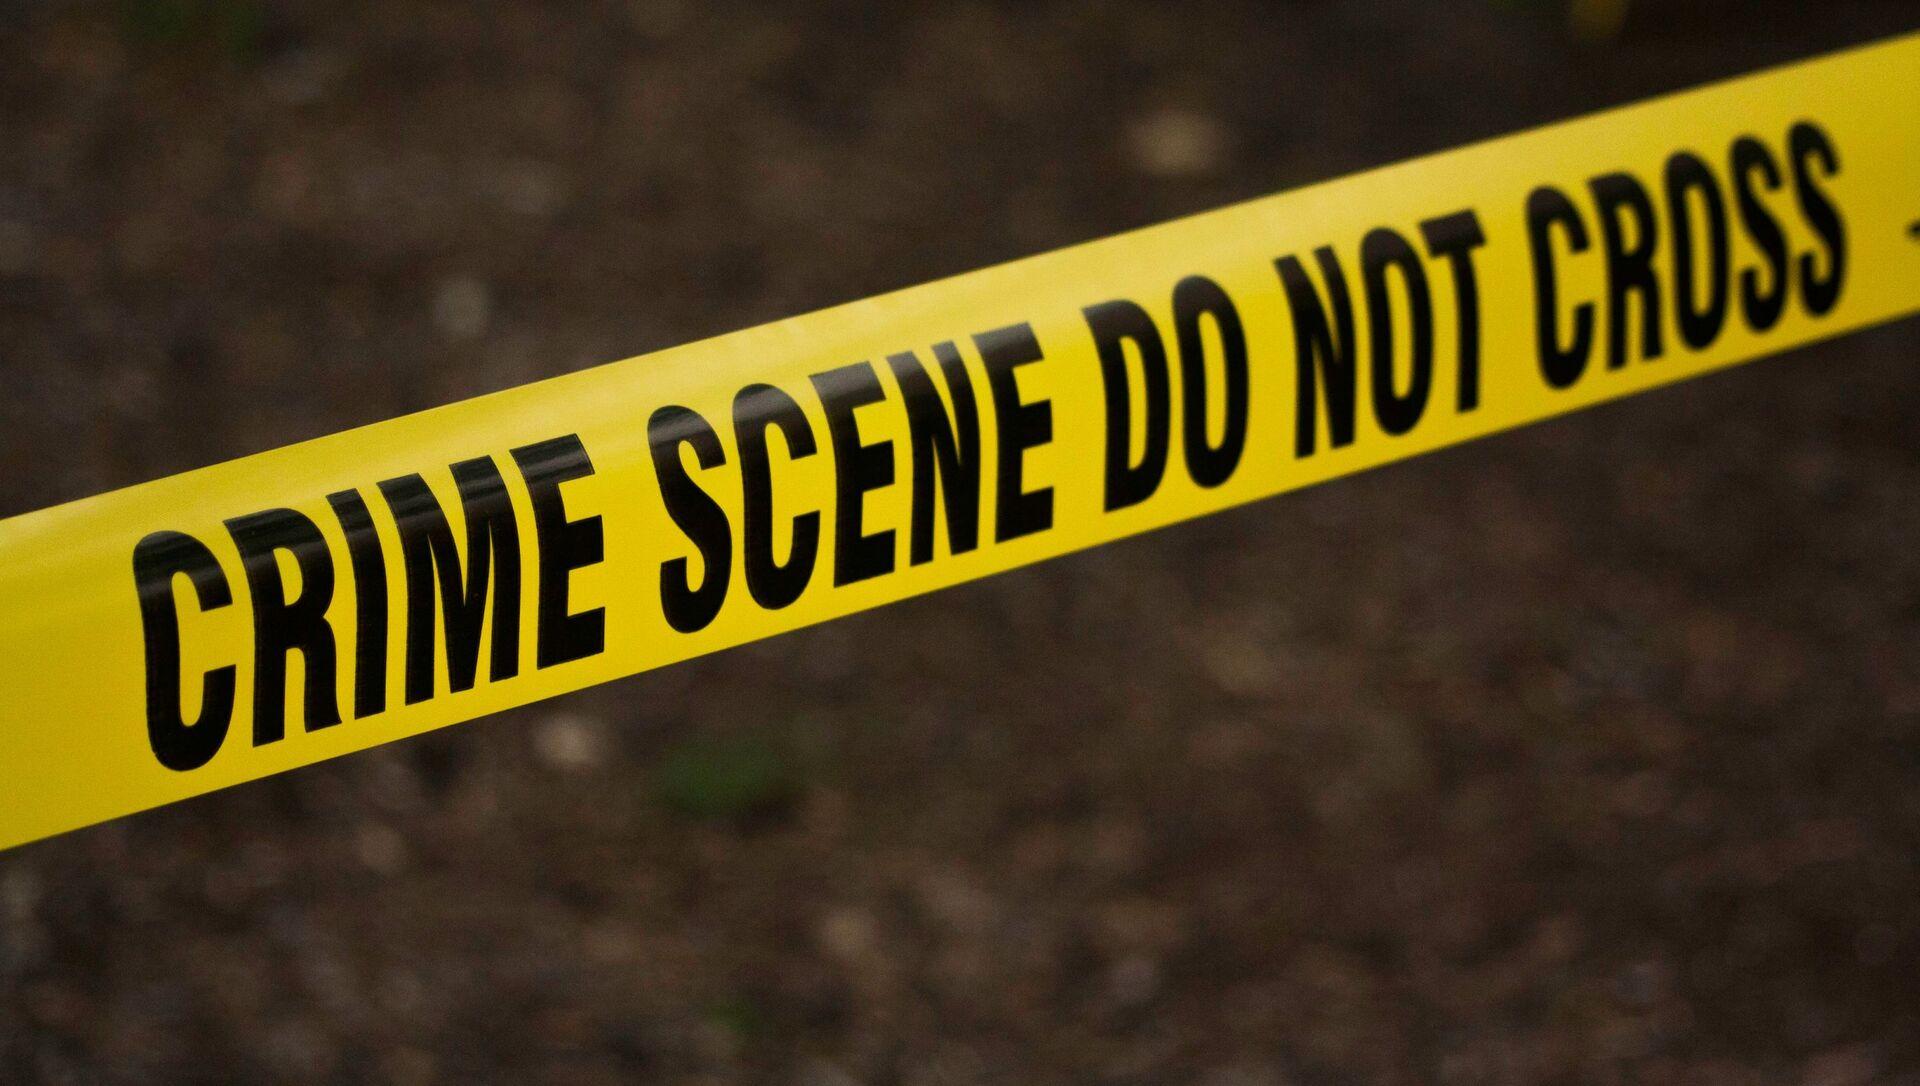 US police crime scene tape - Sputnik International, 1920, 23.06.2021